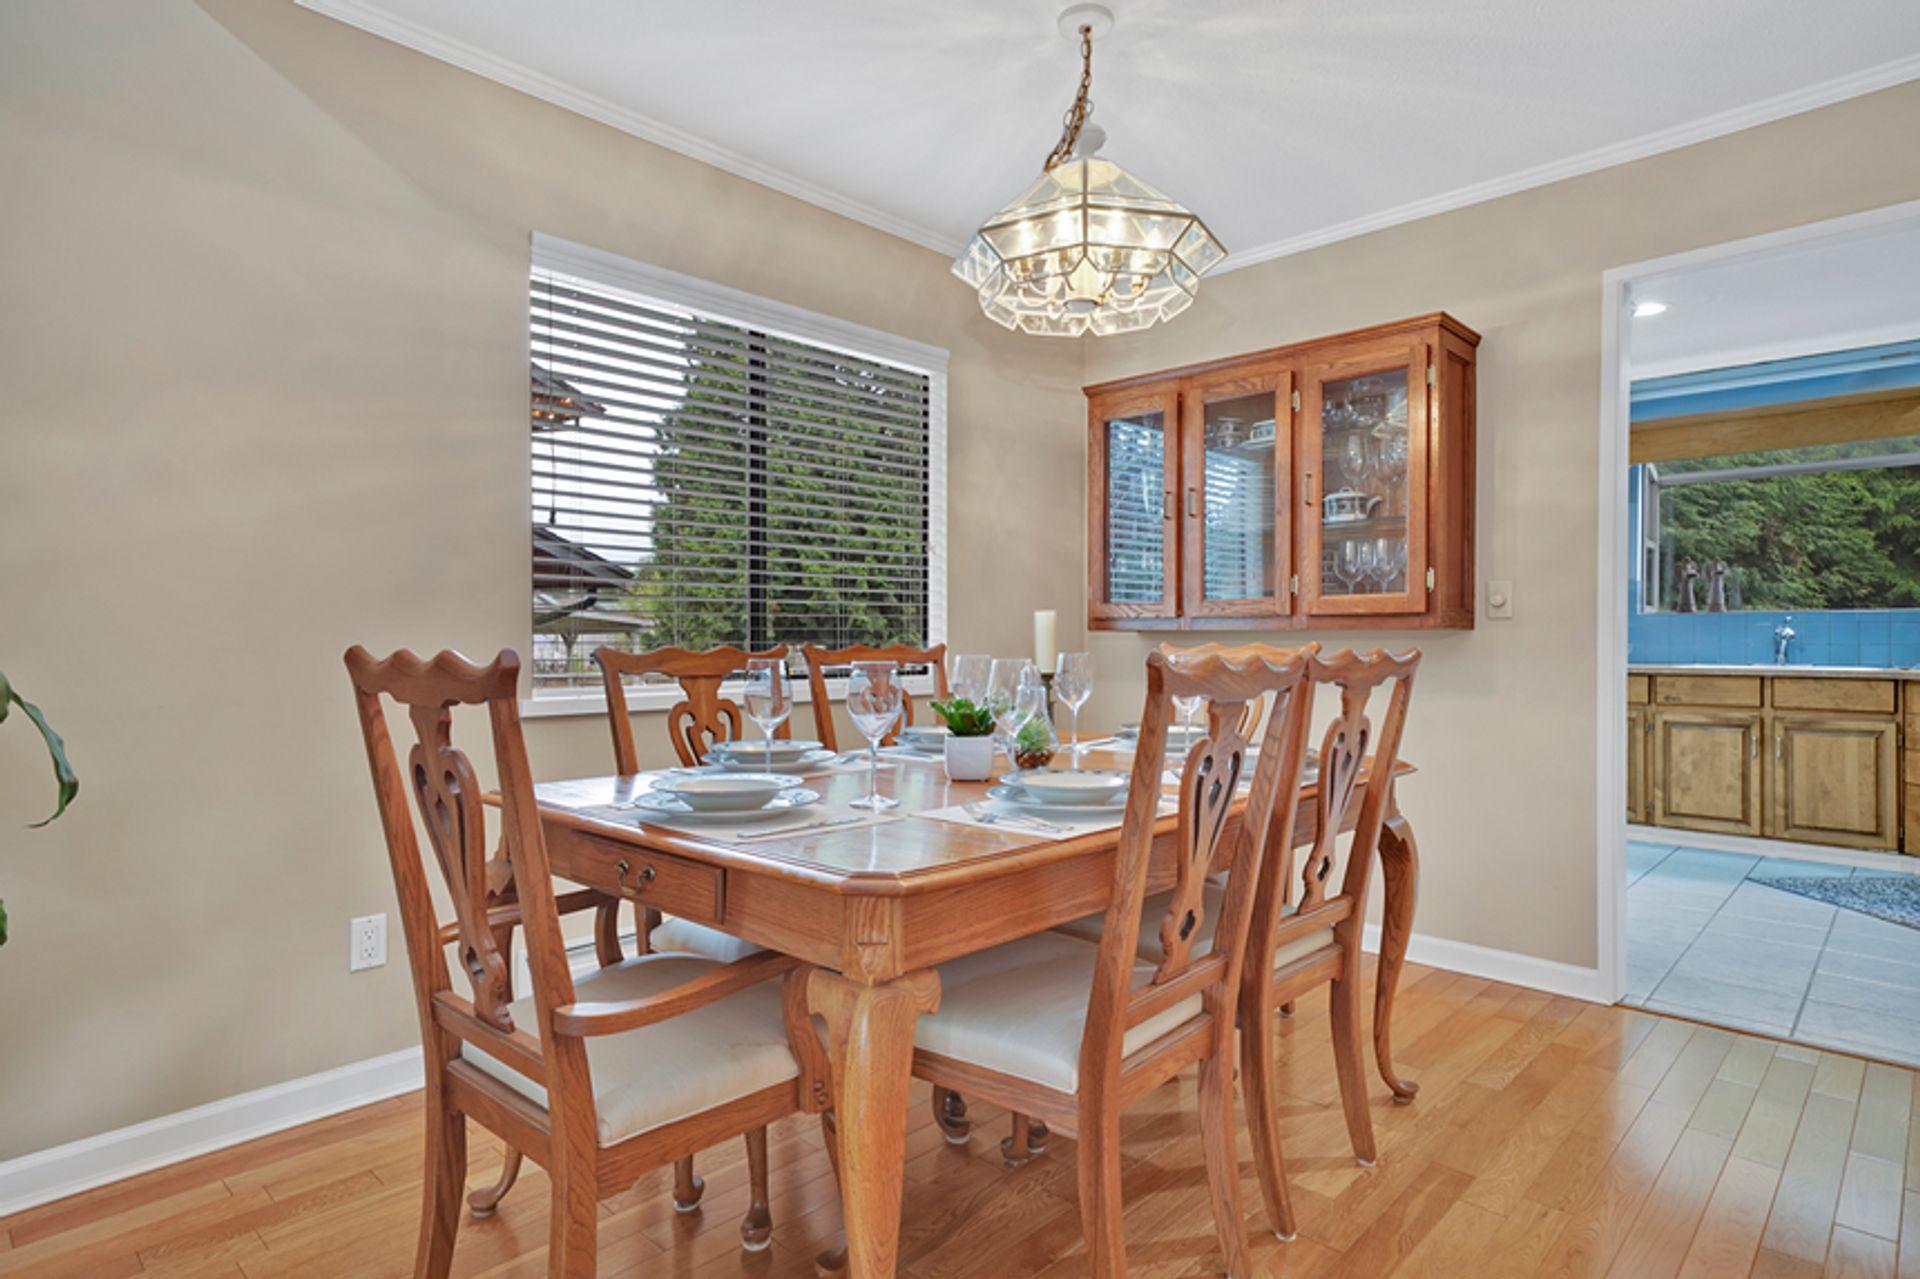 2b-main-dining-room-13 at 836 Irvine Street, Meadow Brook, Coquitlam